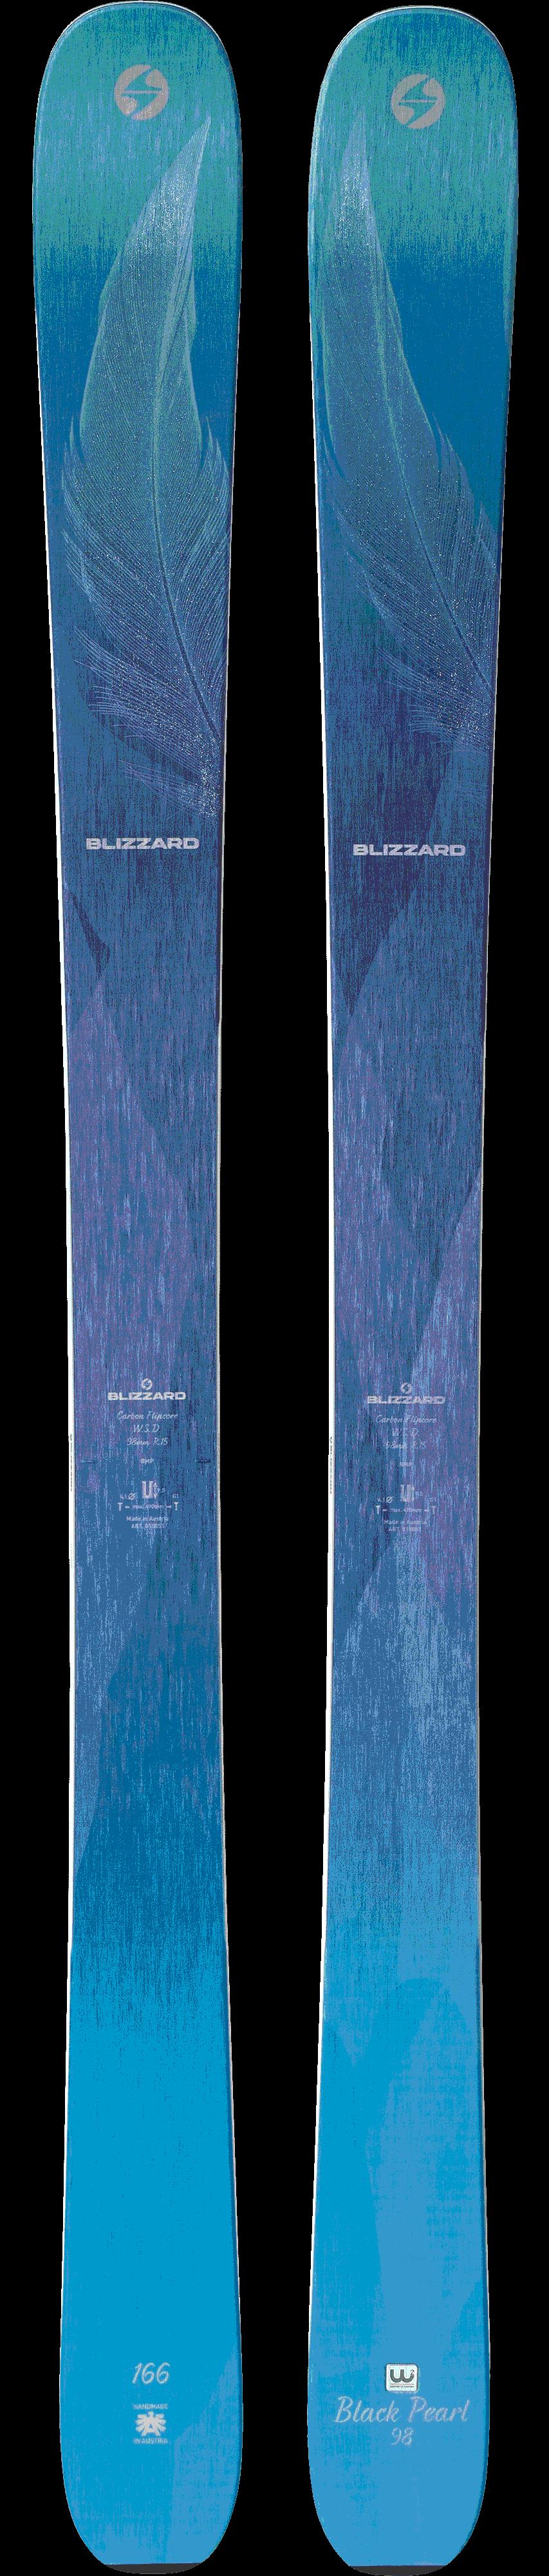 Blizzard Black Pearl 98 Skis 2019